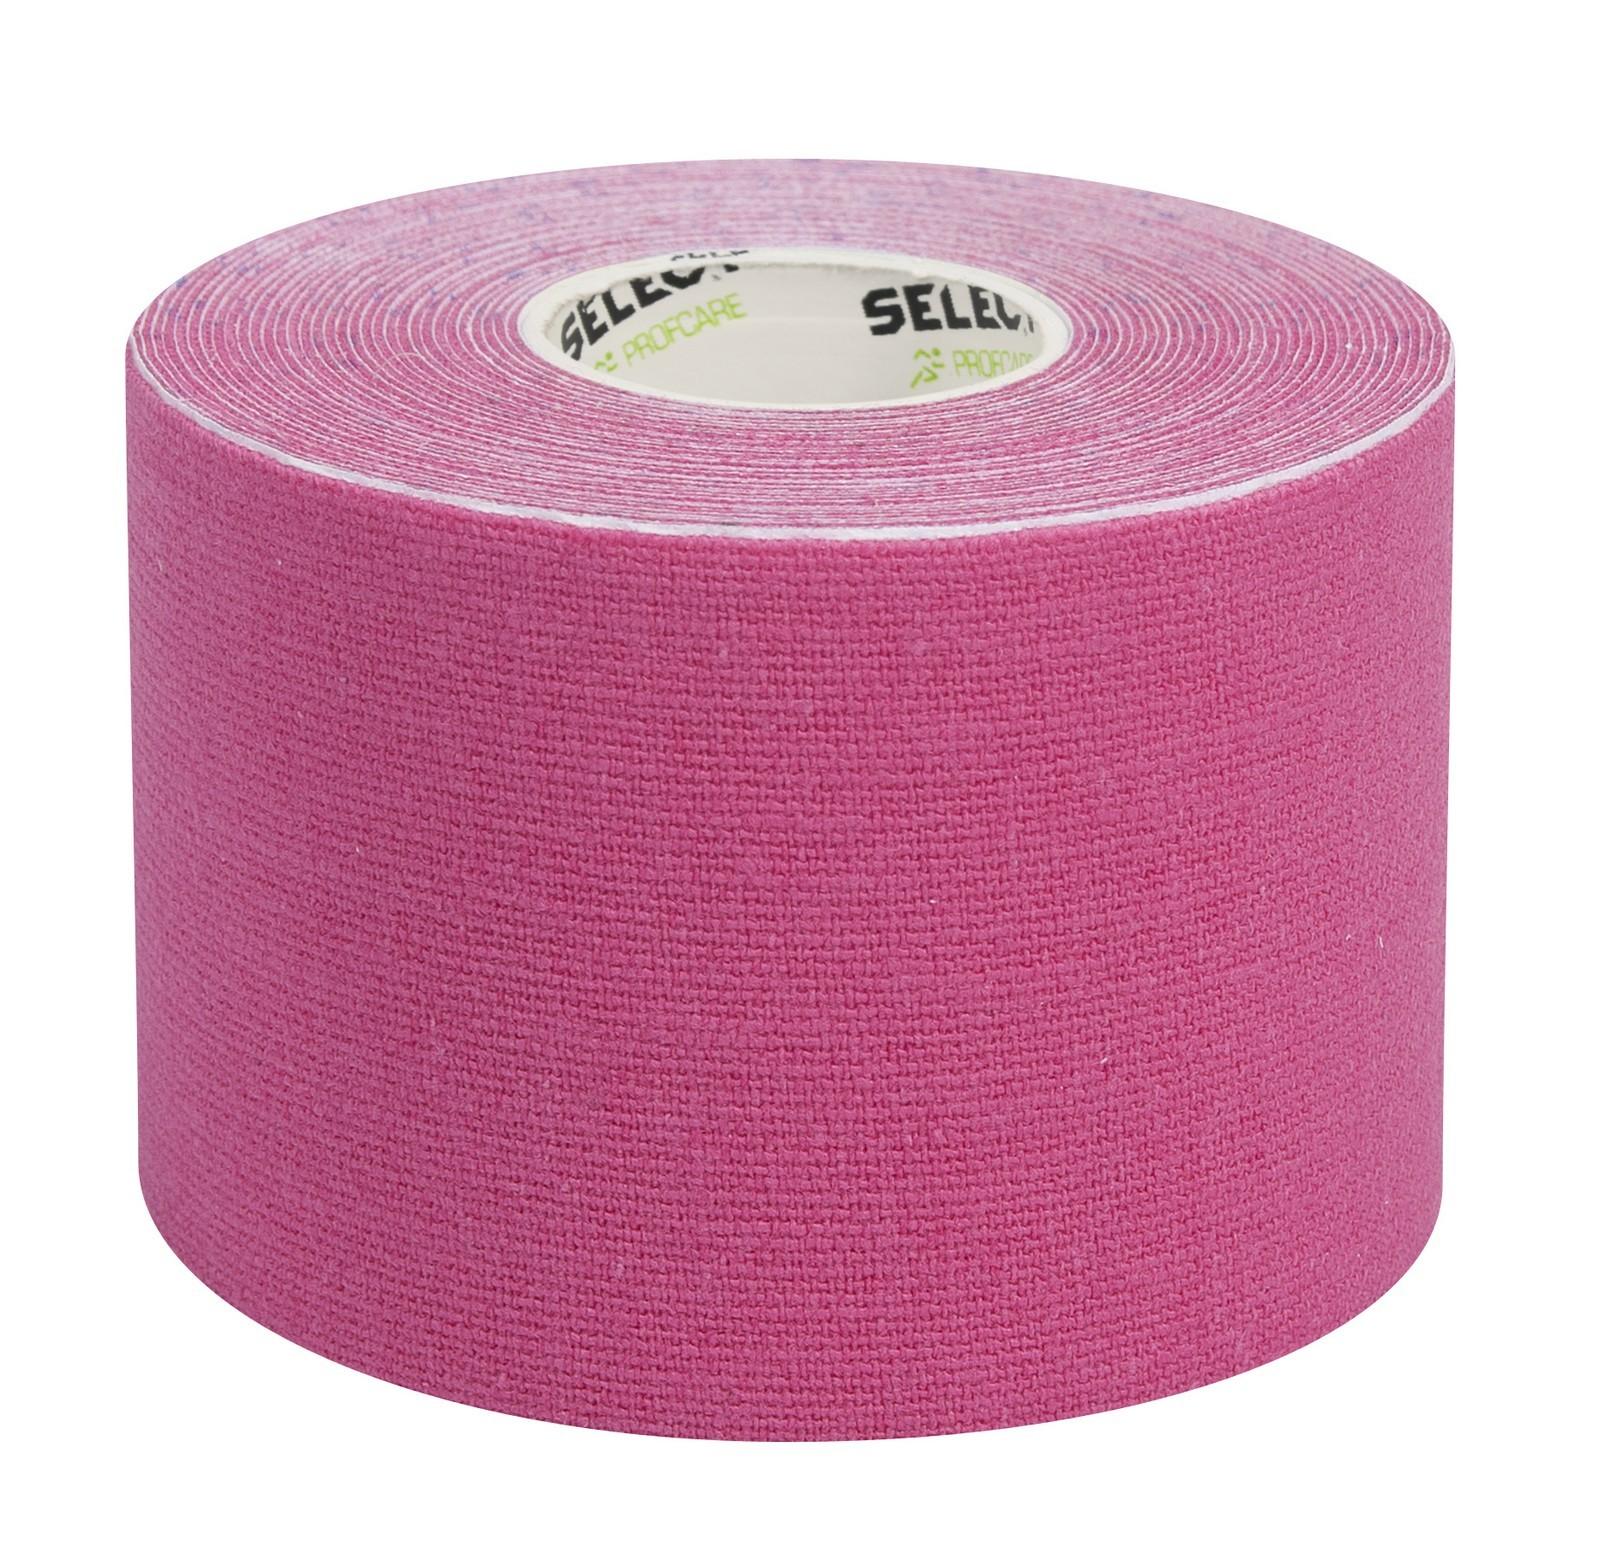 Produkt Kinesio páska